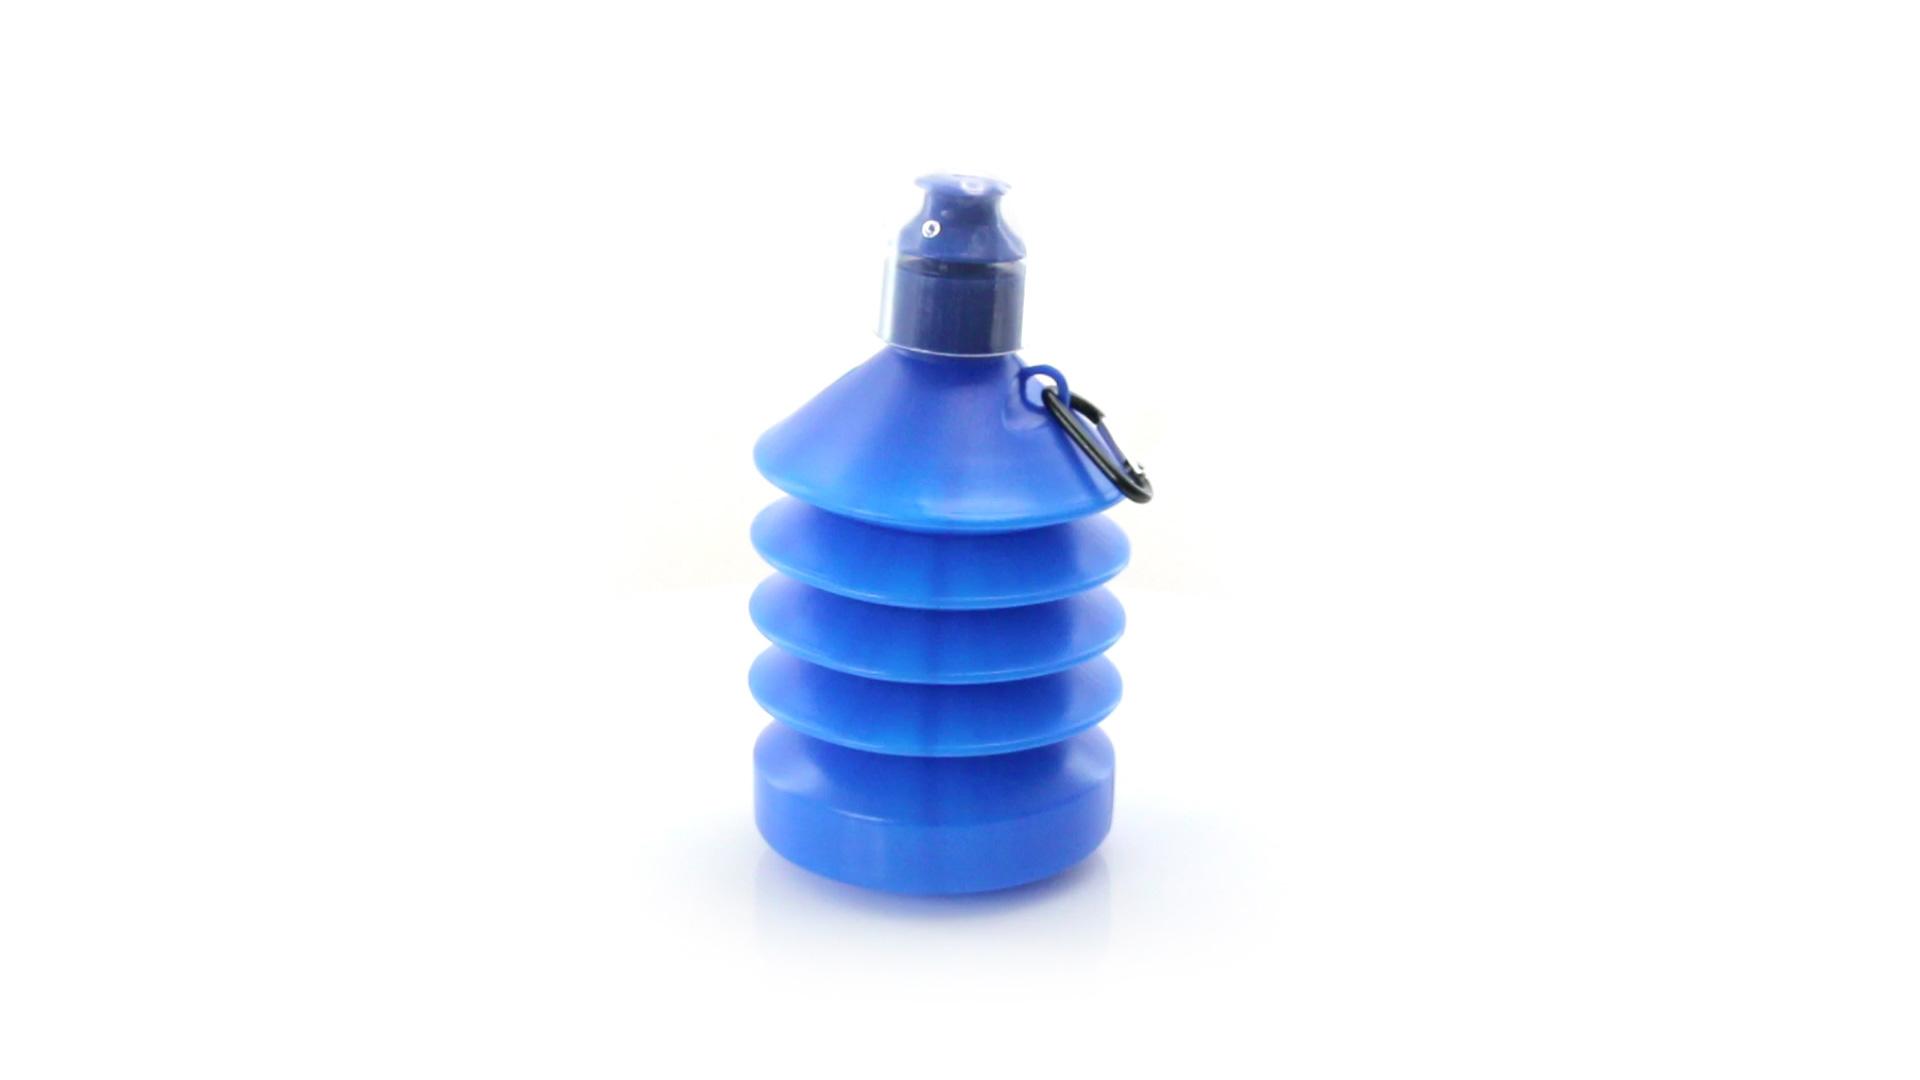 Bidones plegables baratos de color azul